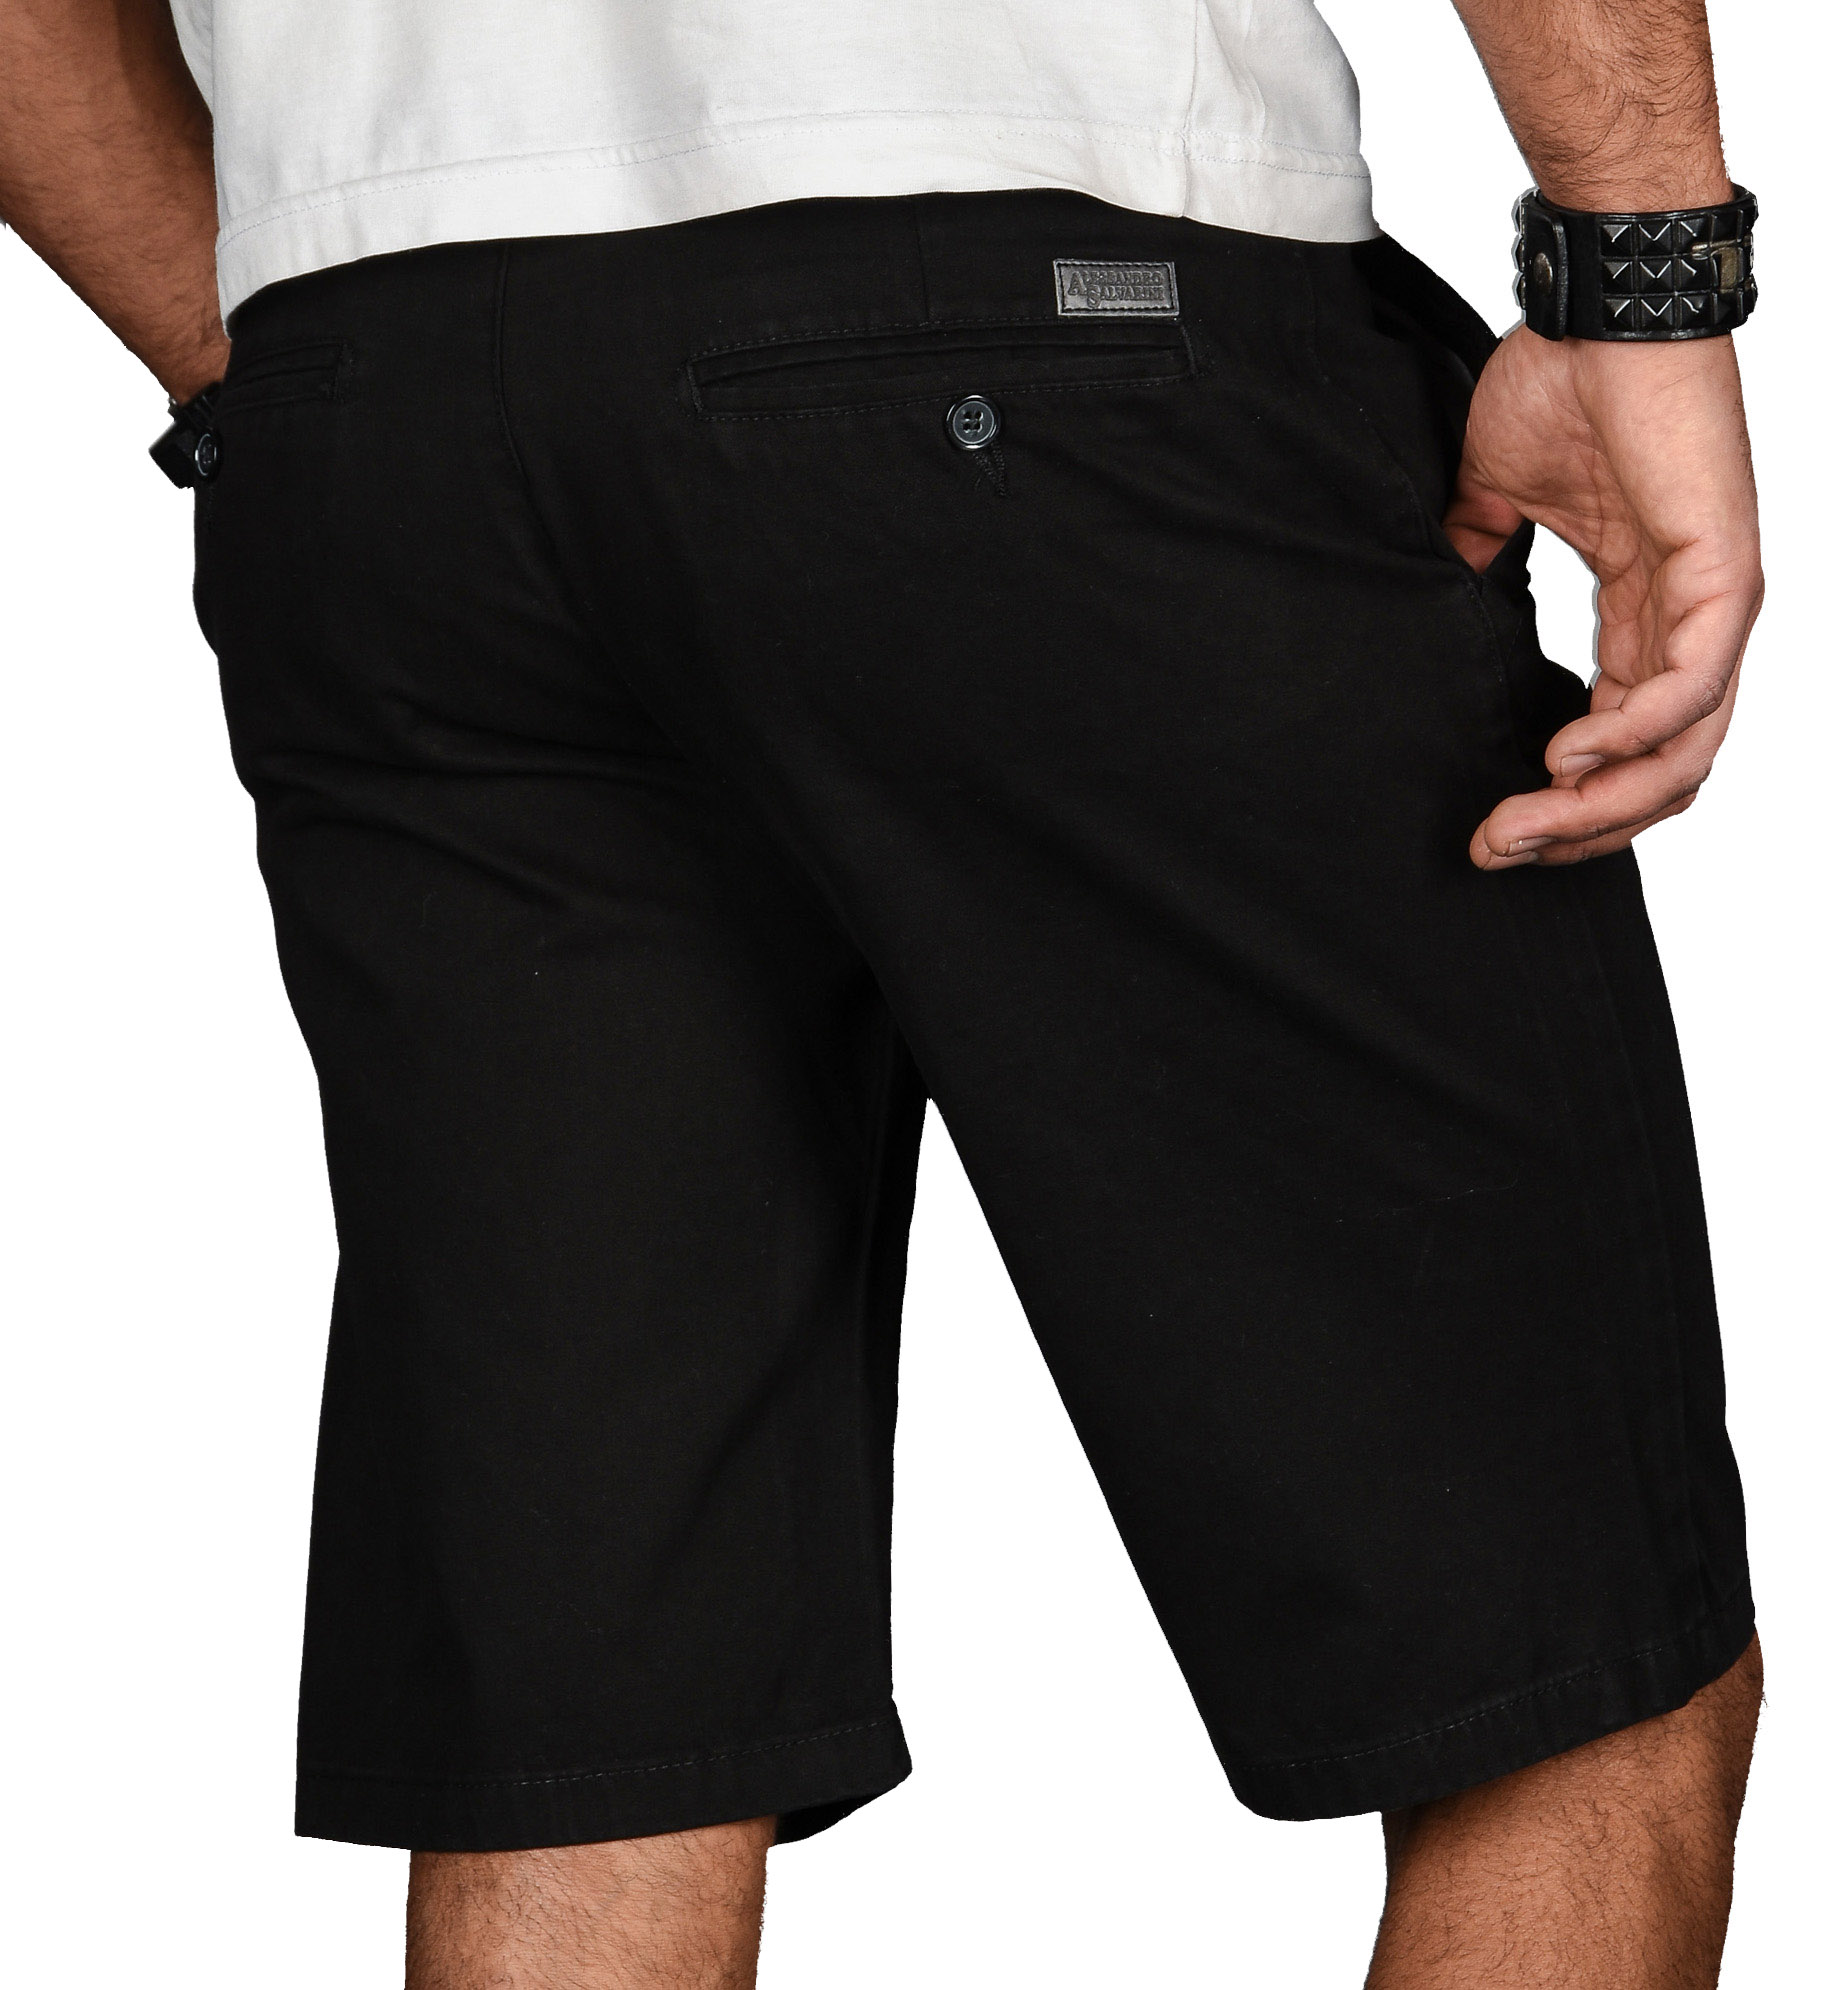 A-Salvarini-Herren-Shorts-kurze-Sommer-Hose-mit-Guertel-Short-Bermuda-NEU-AS096 Indexbild 4